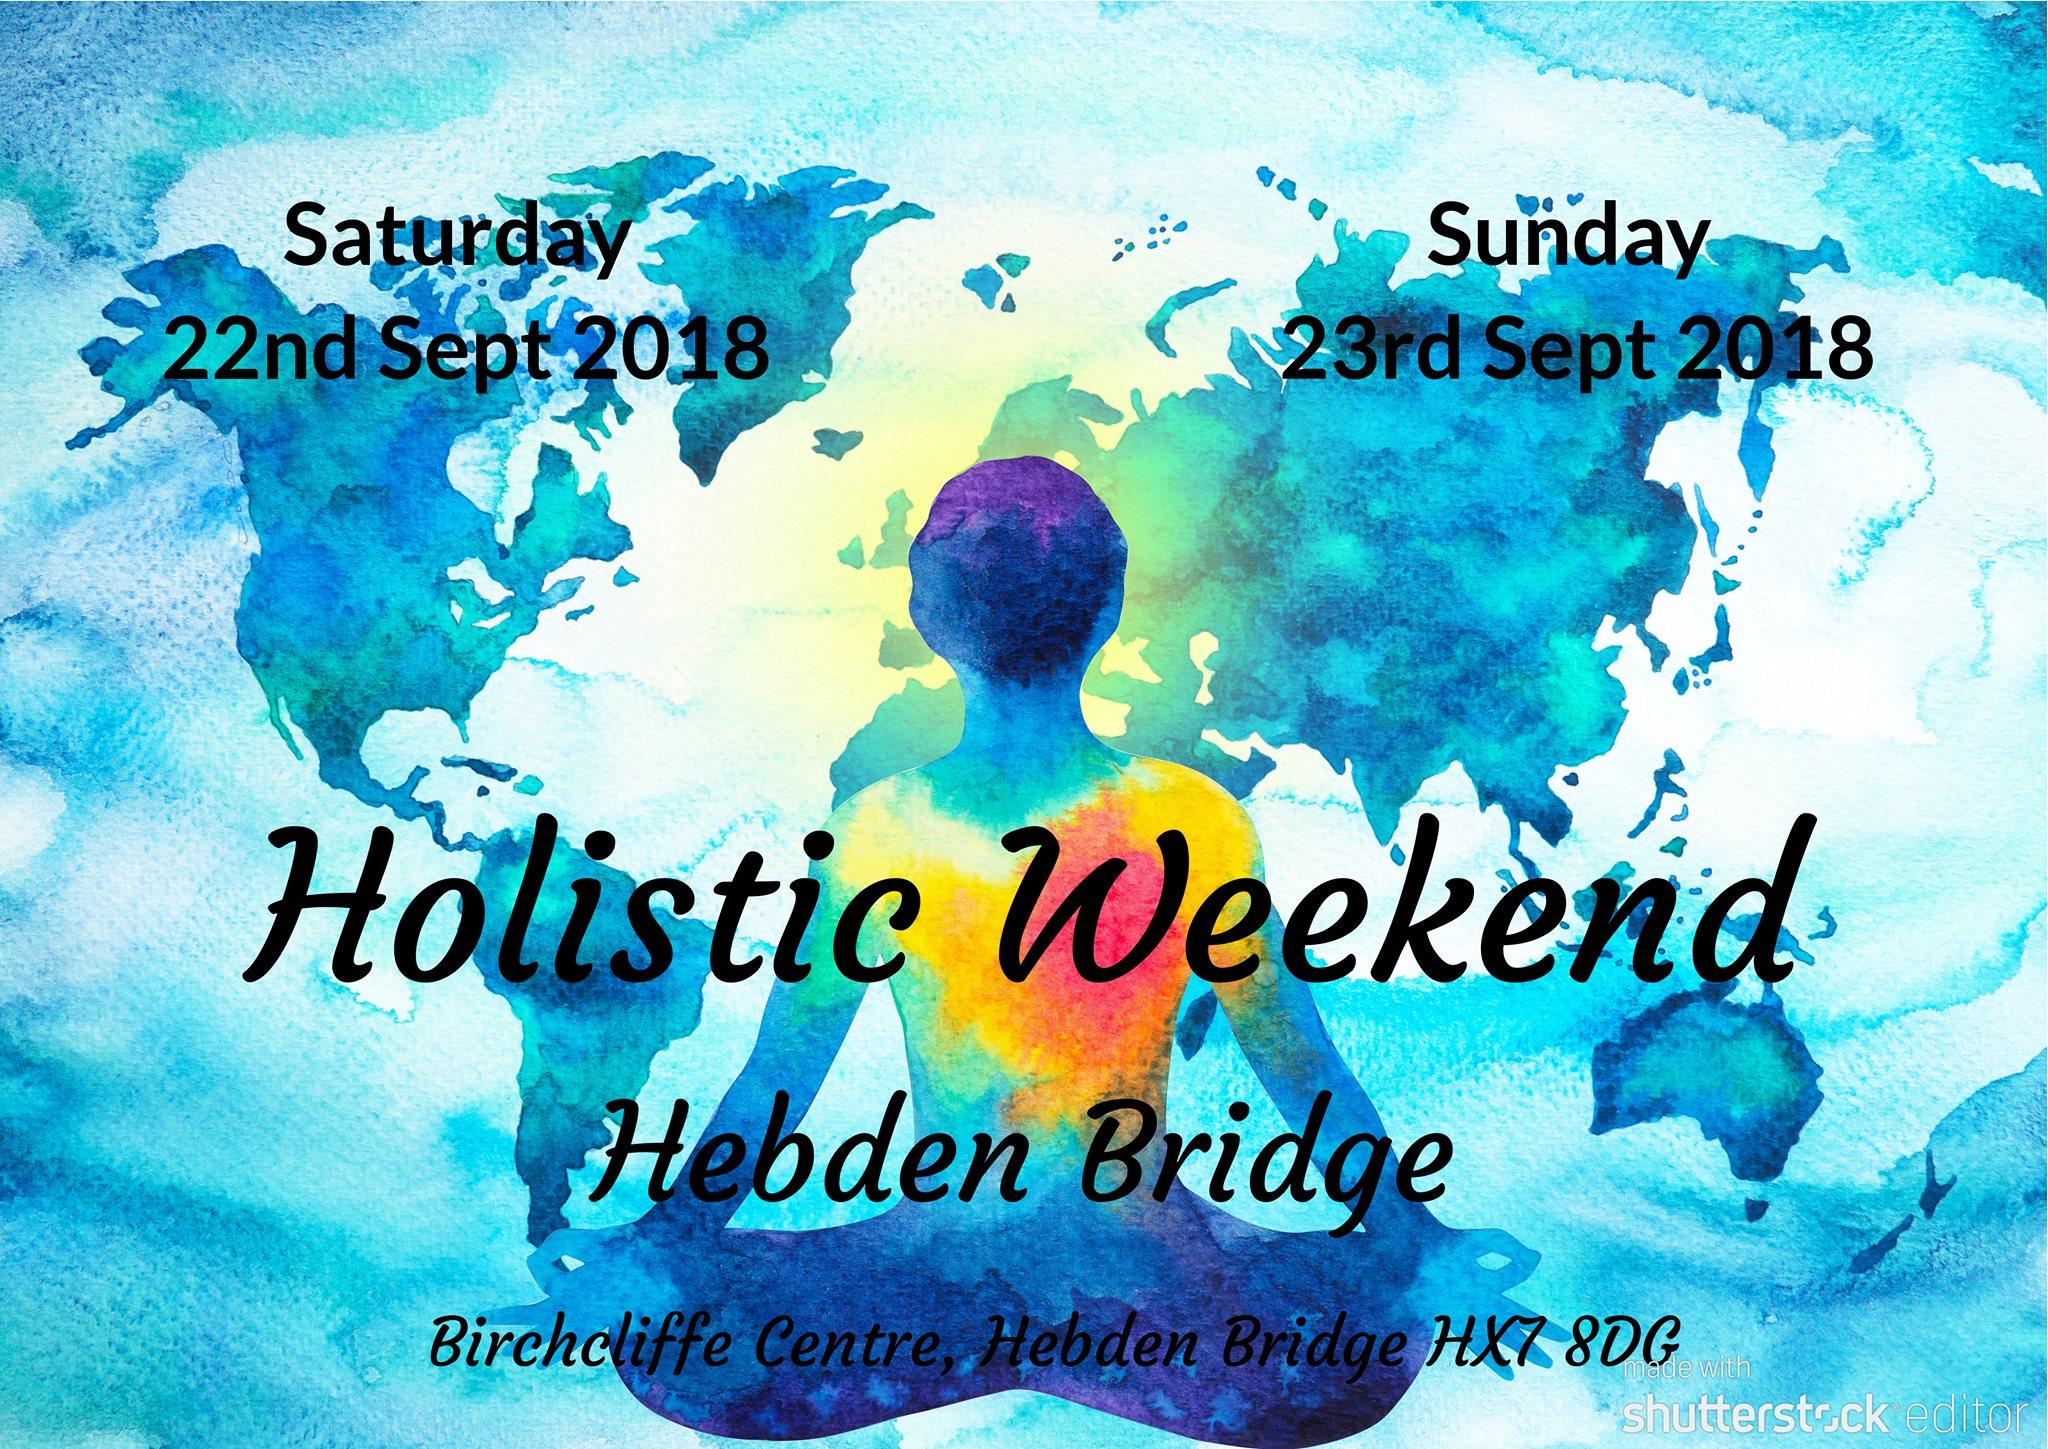 hebden's holistic weekend